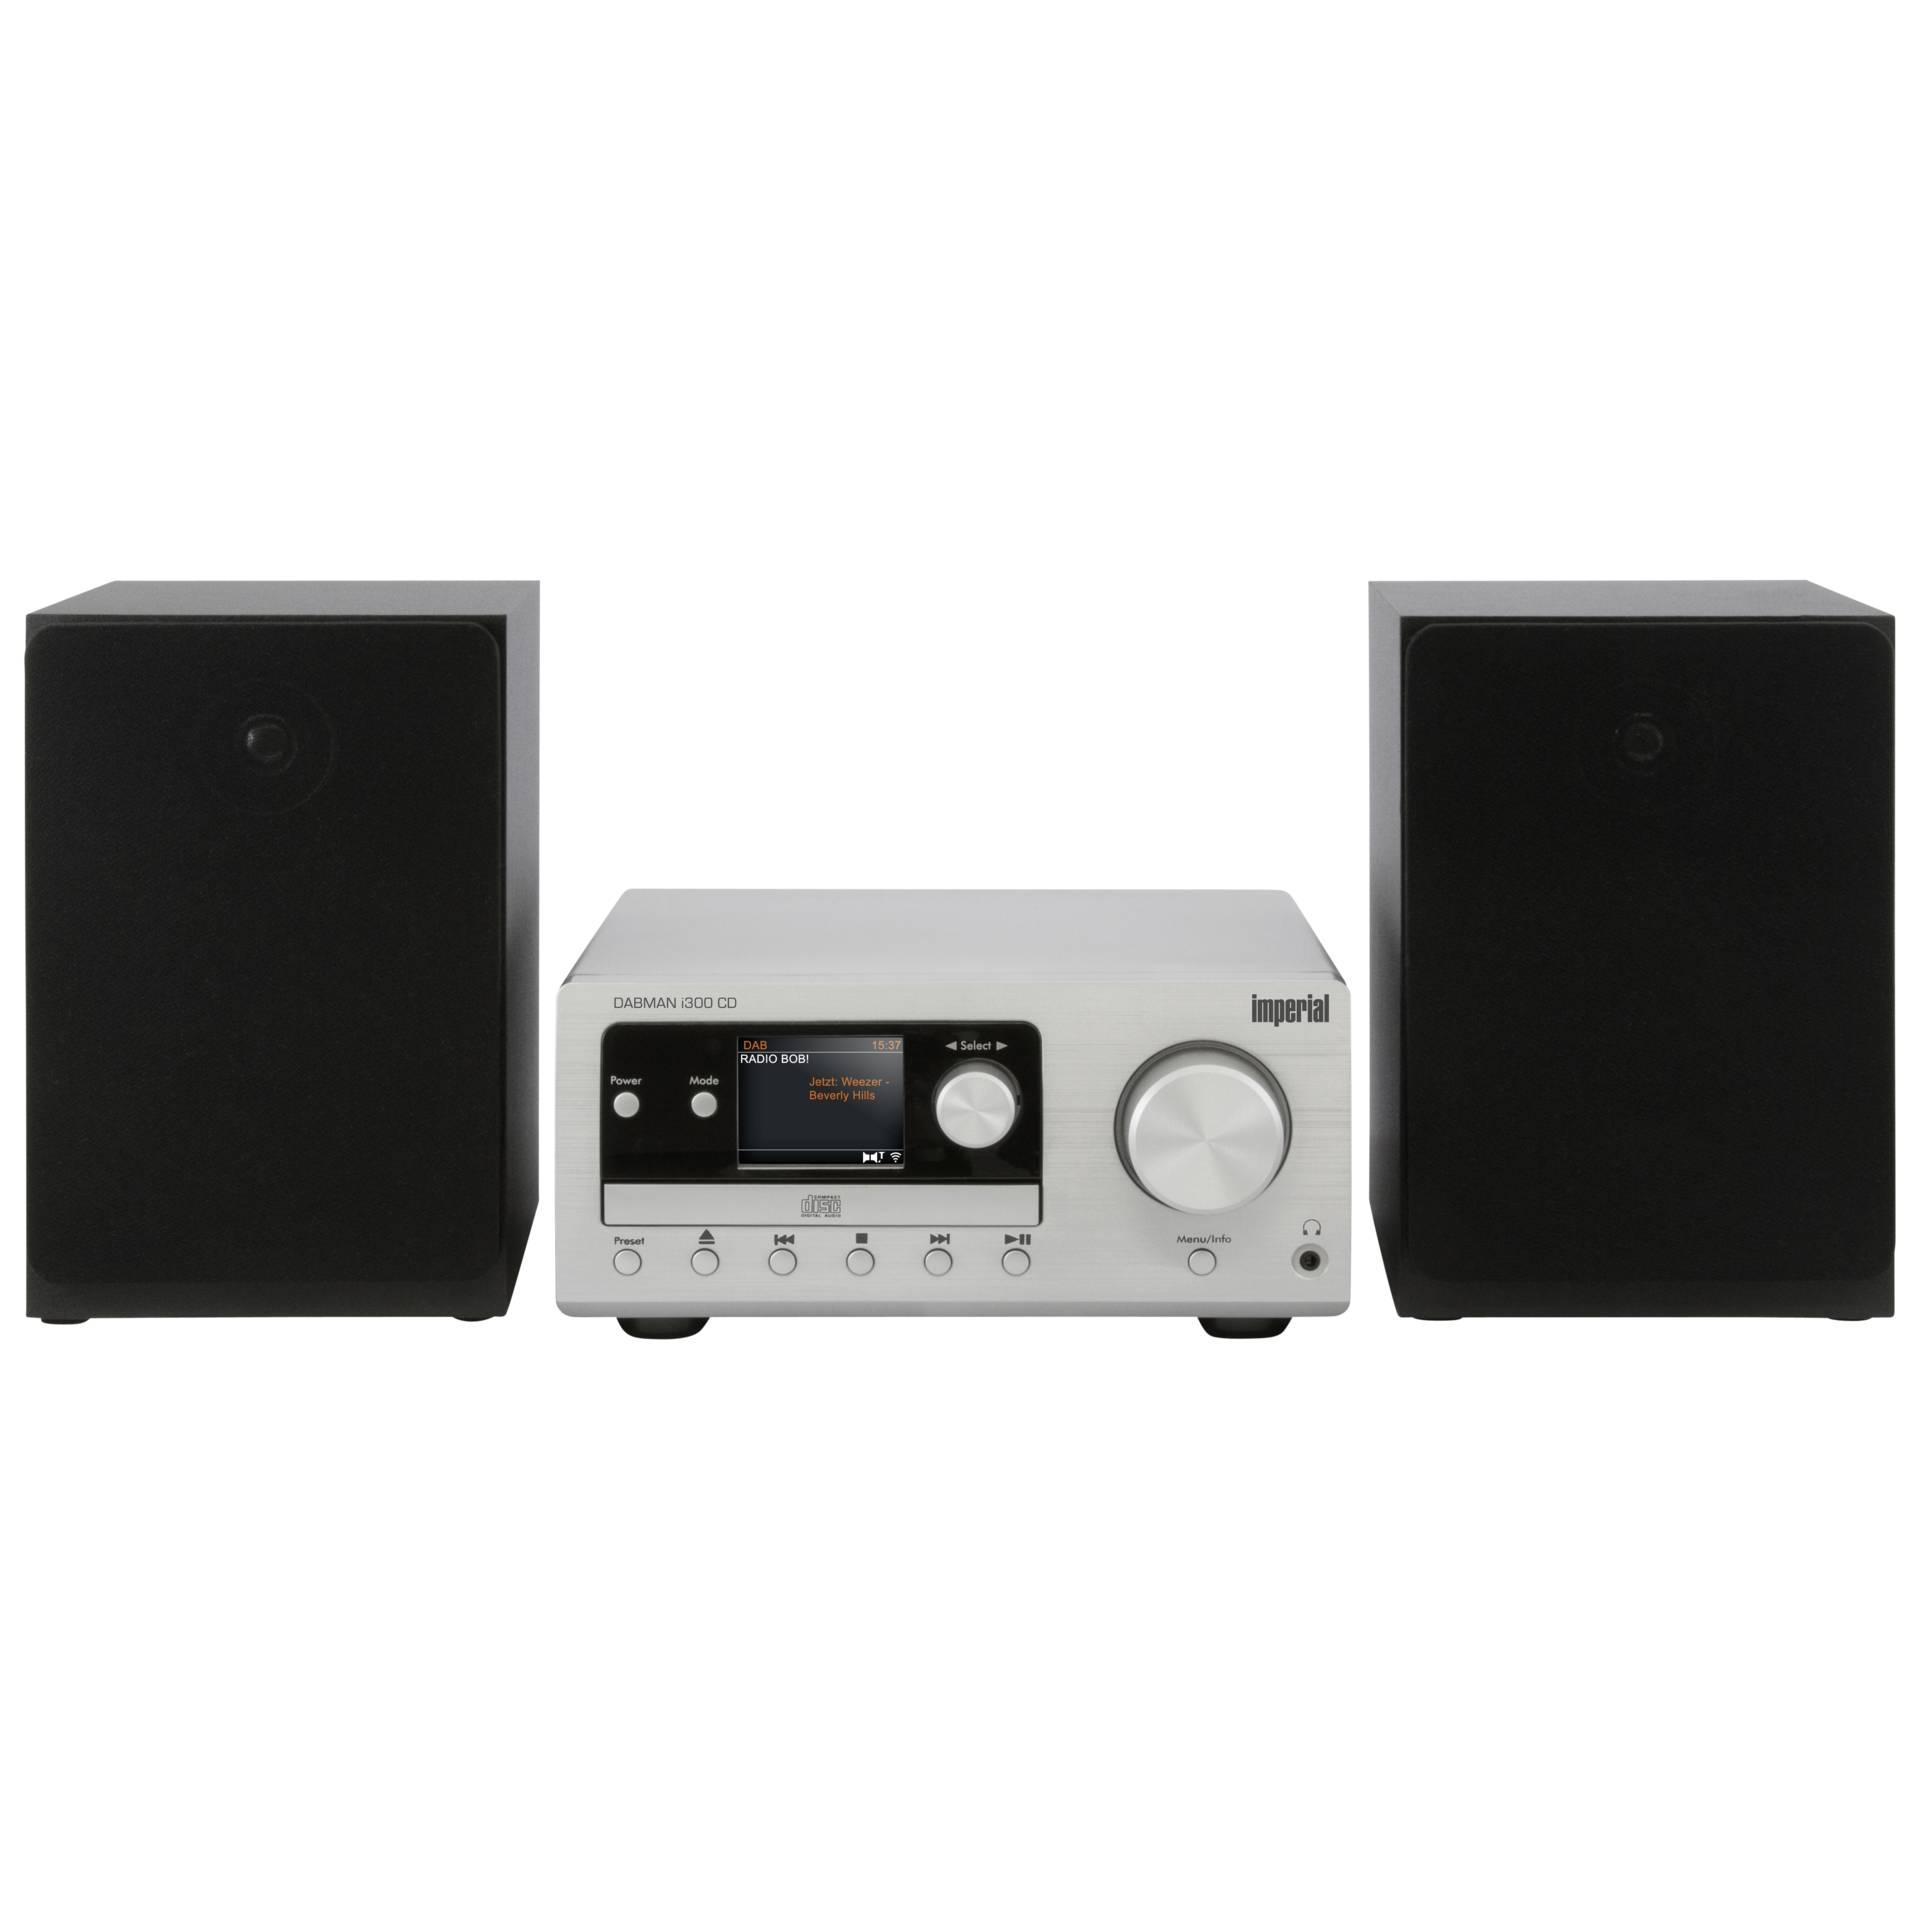 Imperial i300 CD